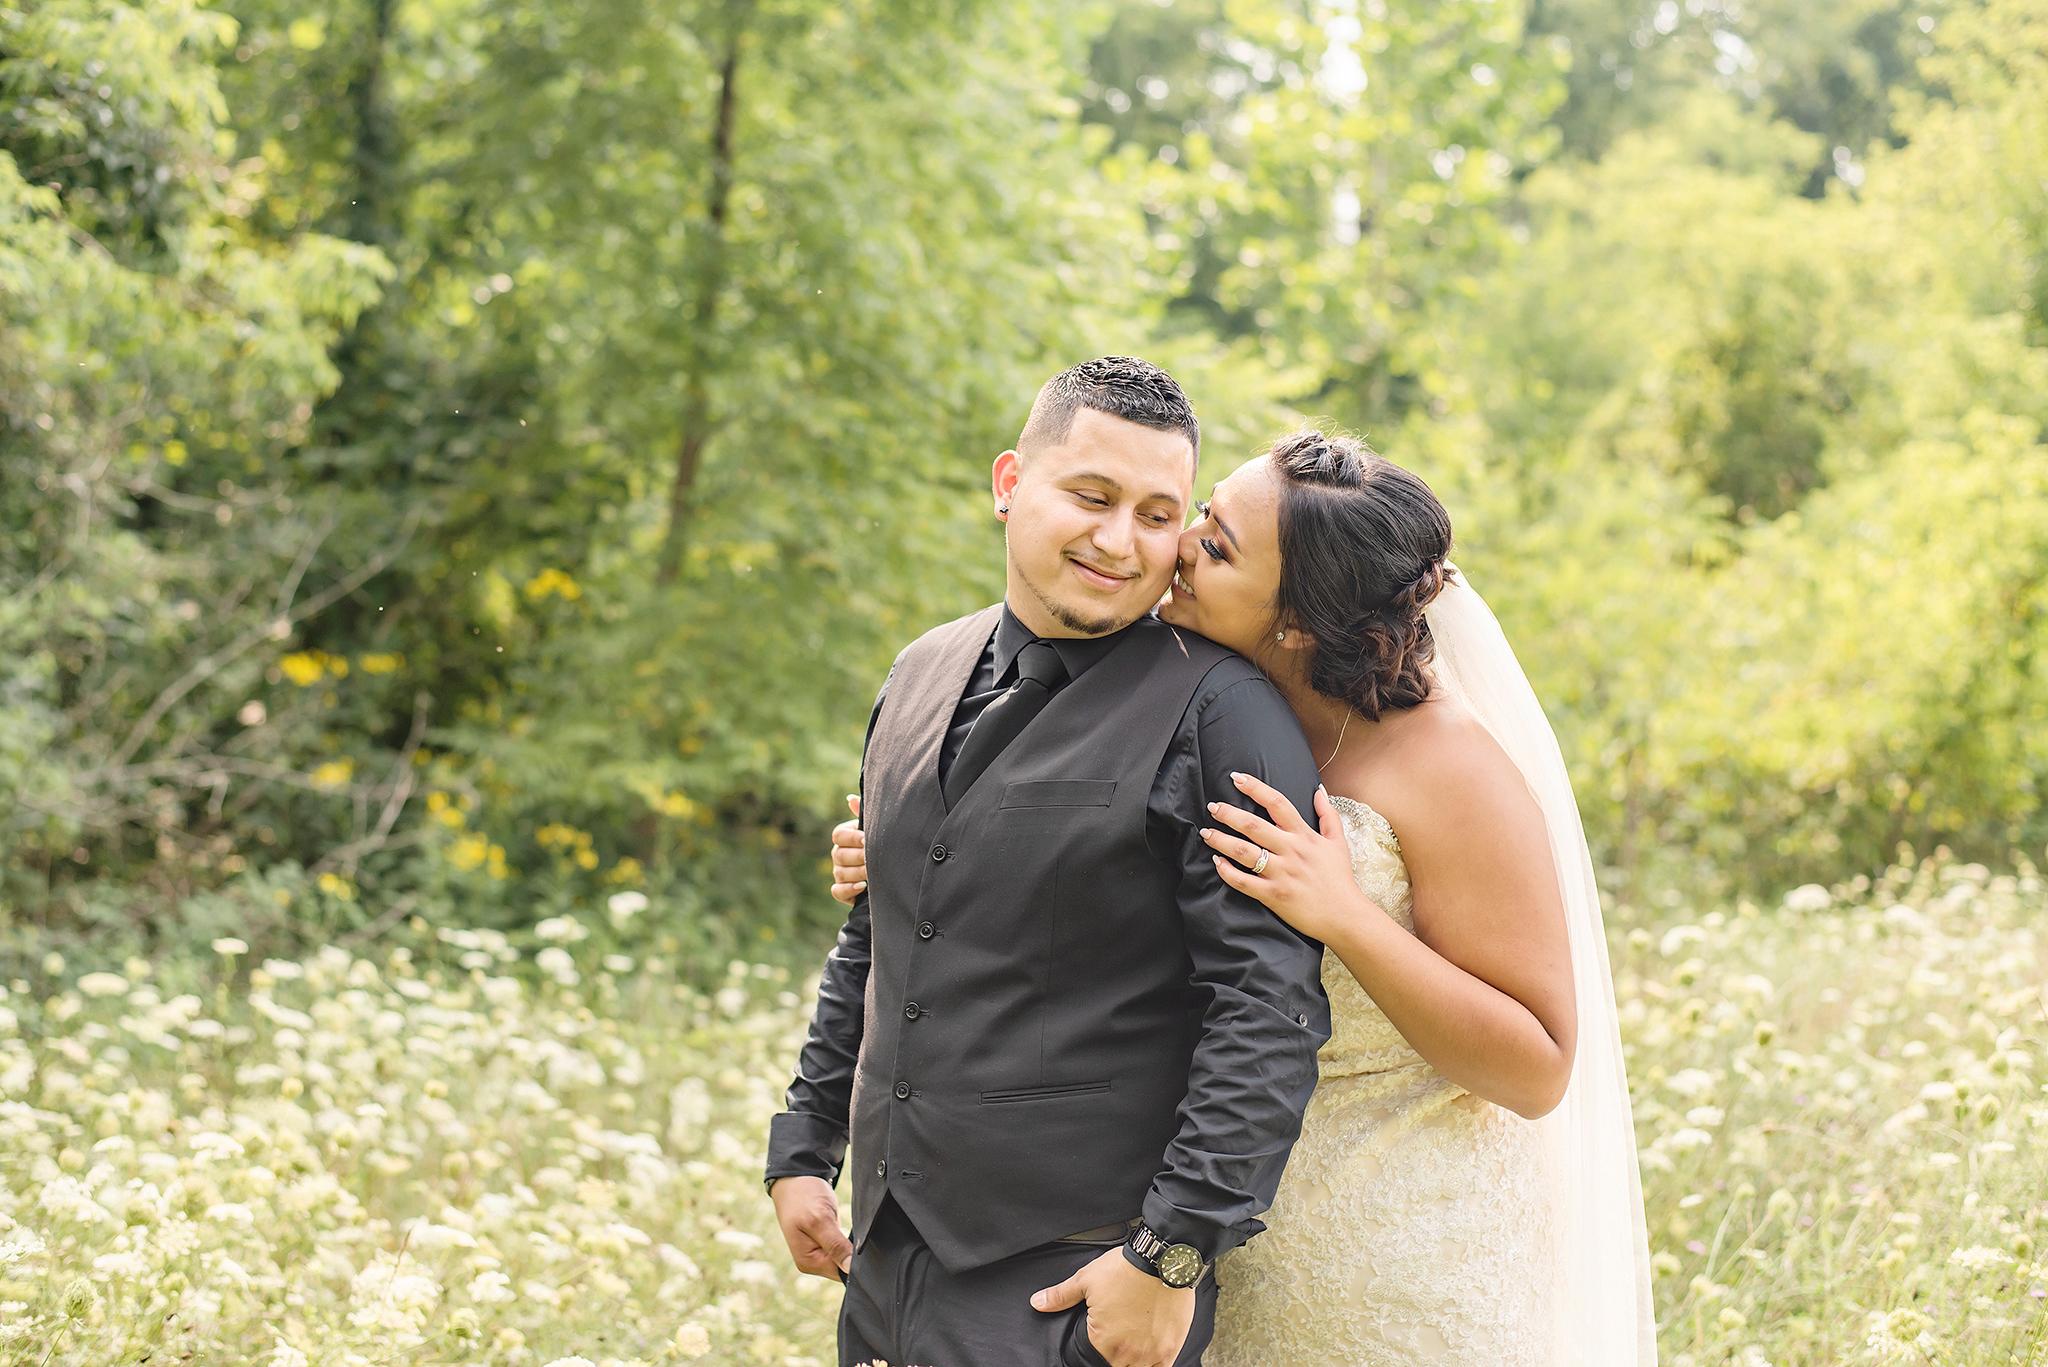 Lindsay-Adkins-Photography-Michigan-Wedding-Photographer-BernalBlog-14